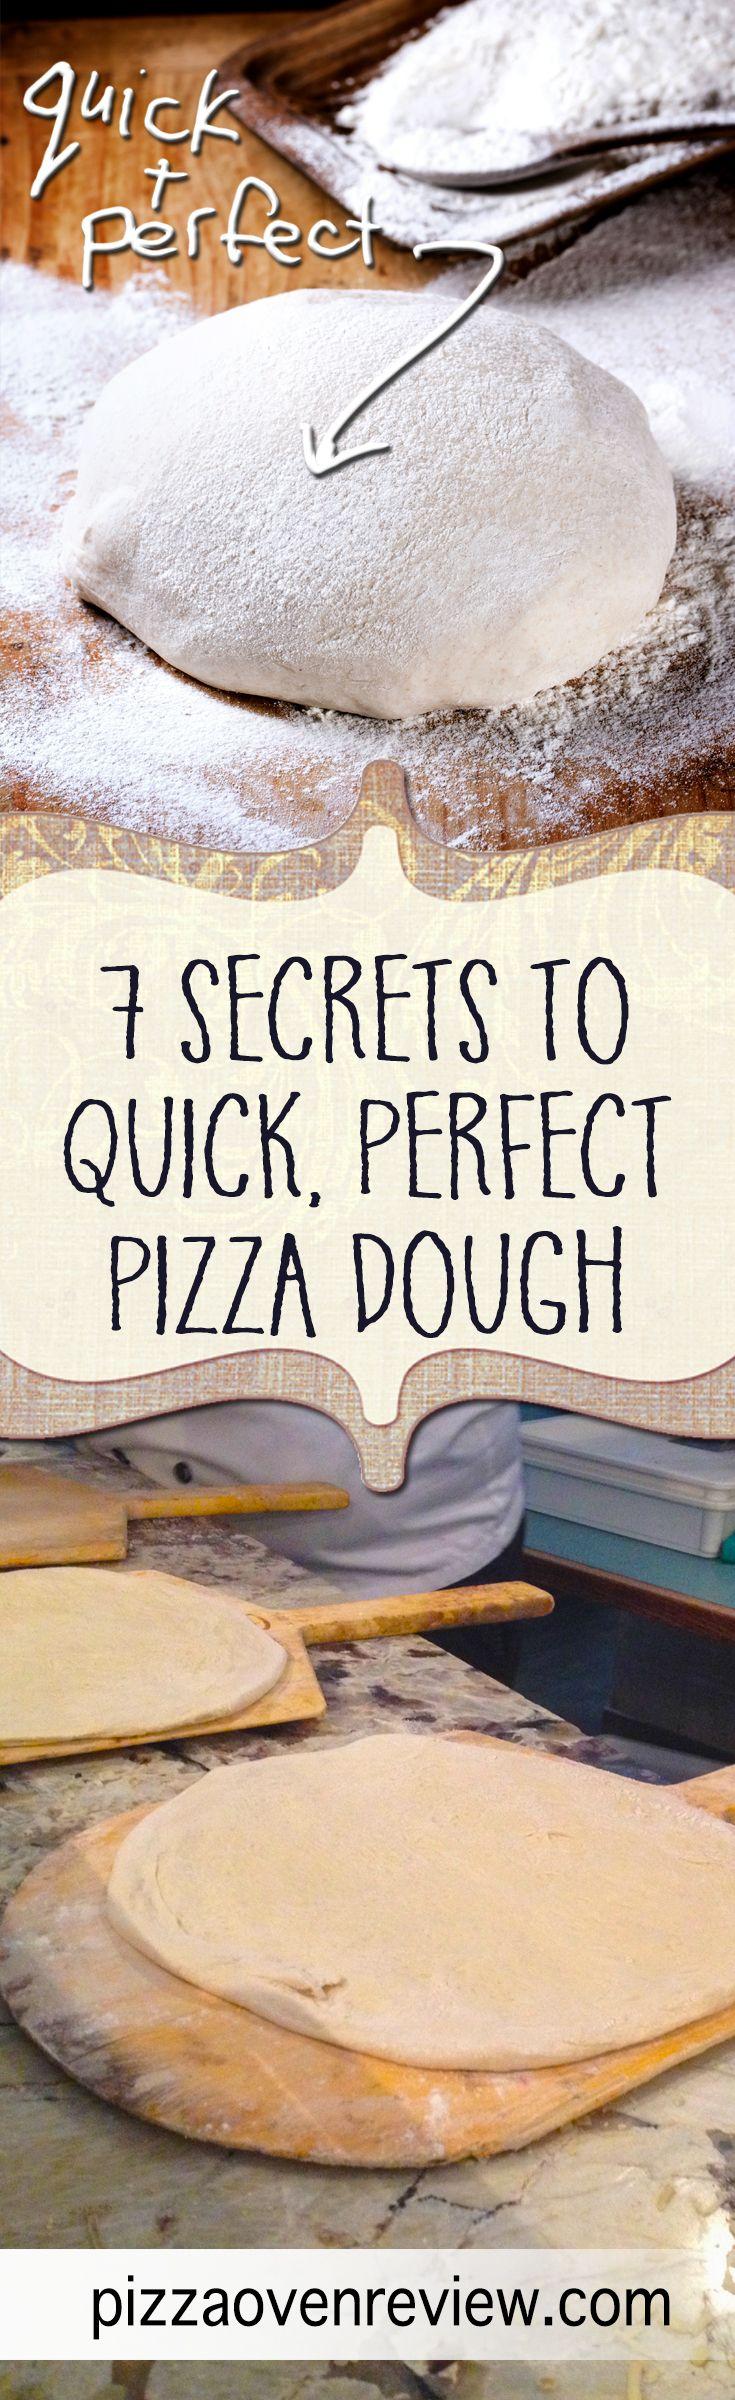 7 secrets to quick, perfect pizza dough